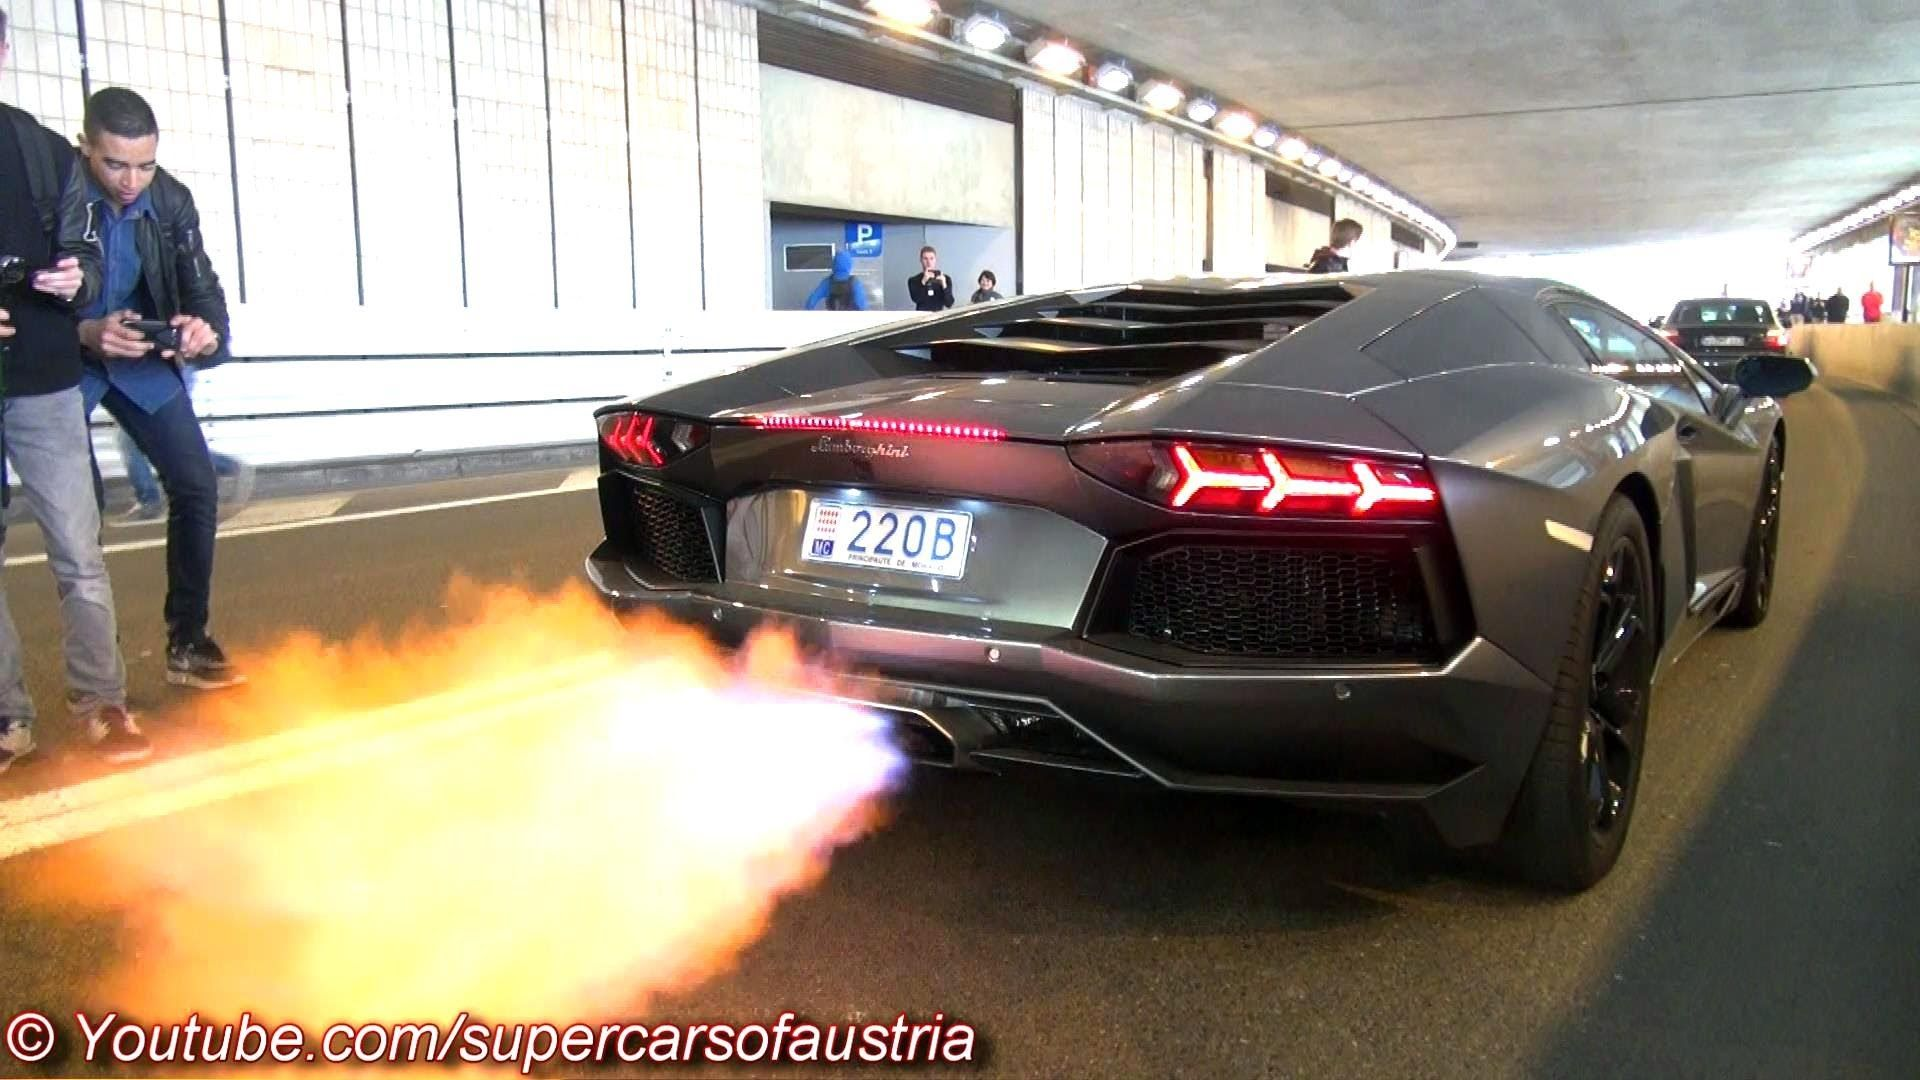 Lamborghini Aventador Shooting Huge Flames Lamborghini Aventador Lamborghini Dream Cars